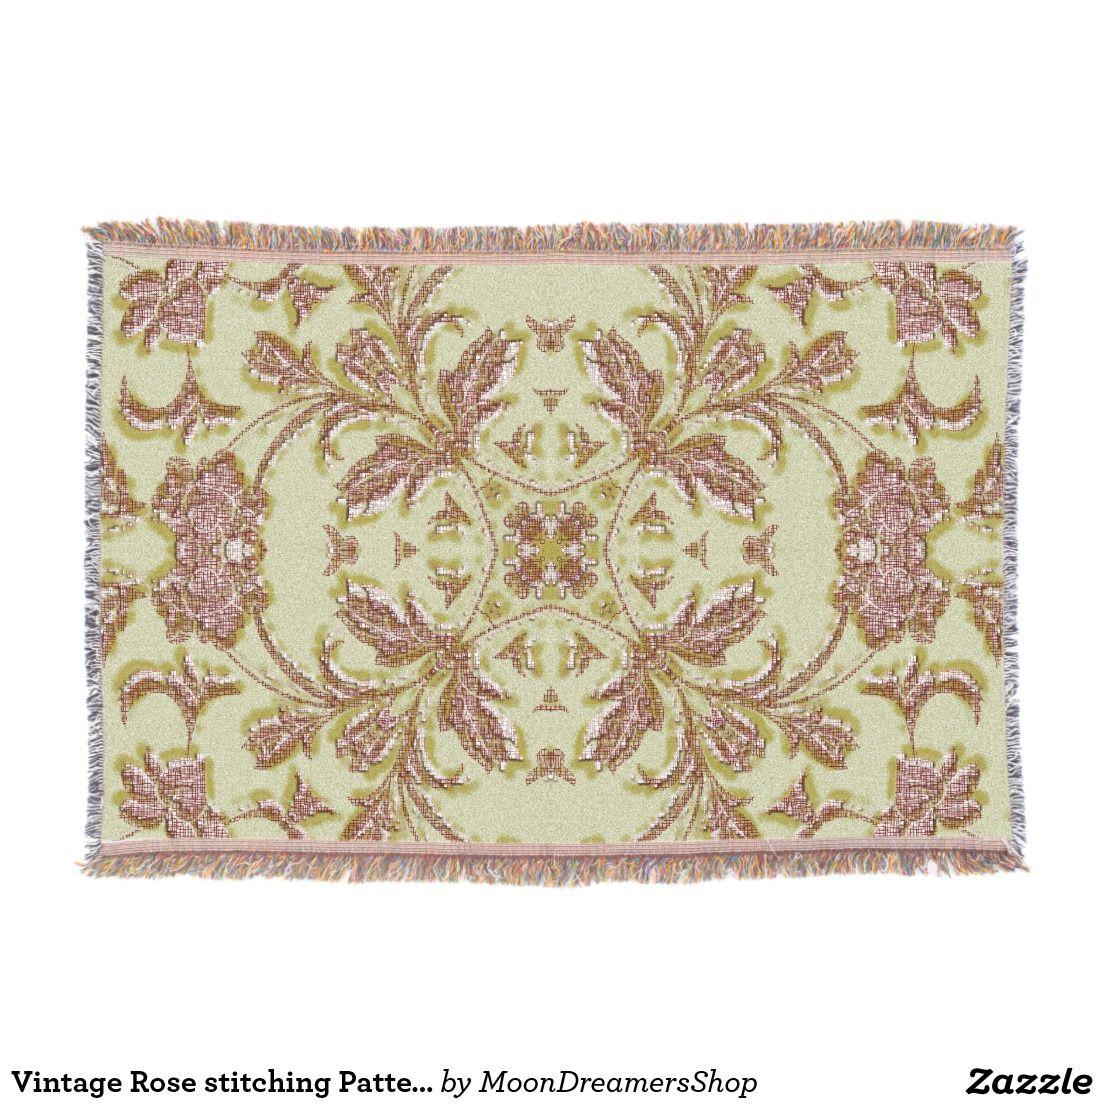 Vintage rose stitching pattern throw blanket blanket stitch and